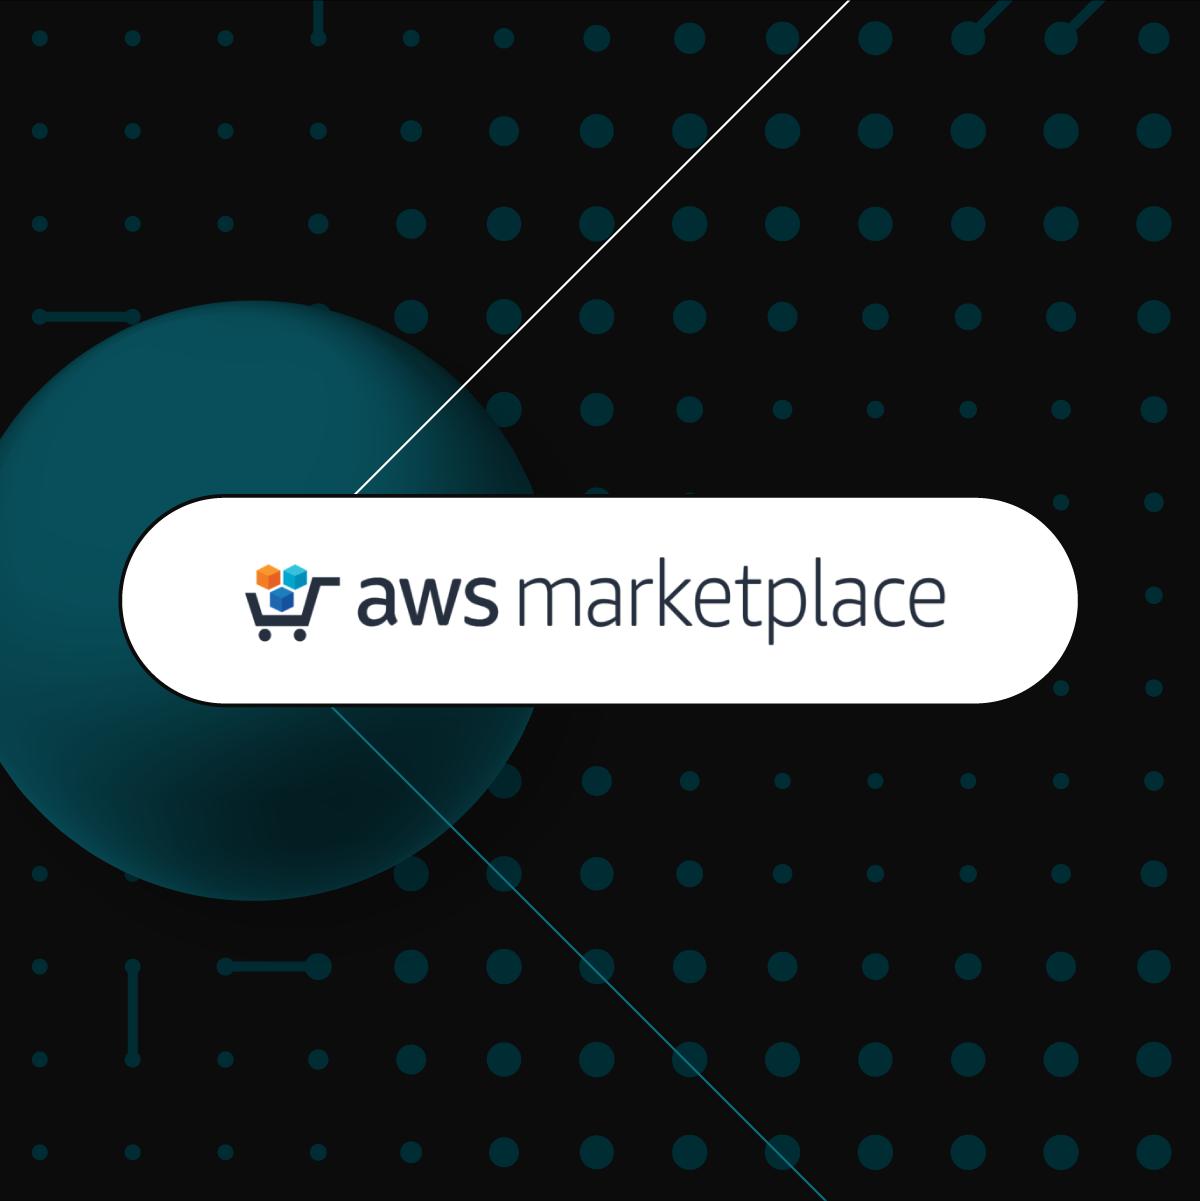 Image of Aws marketplace 1200x1200px